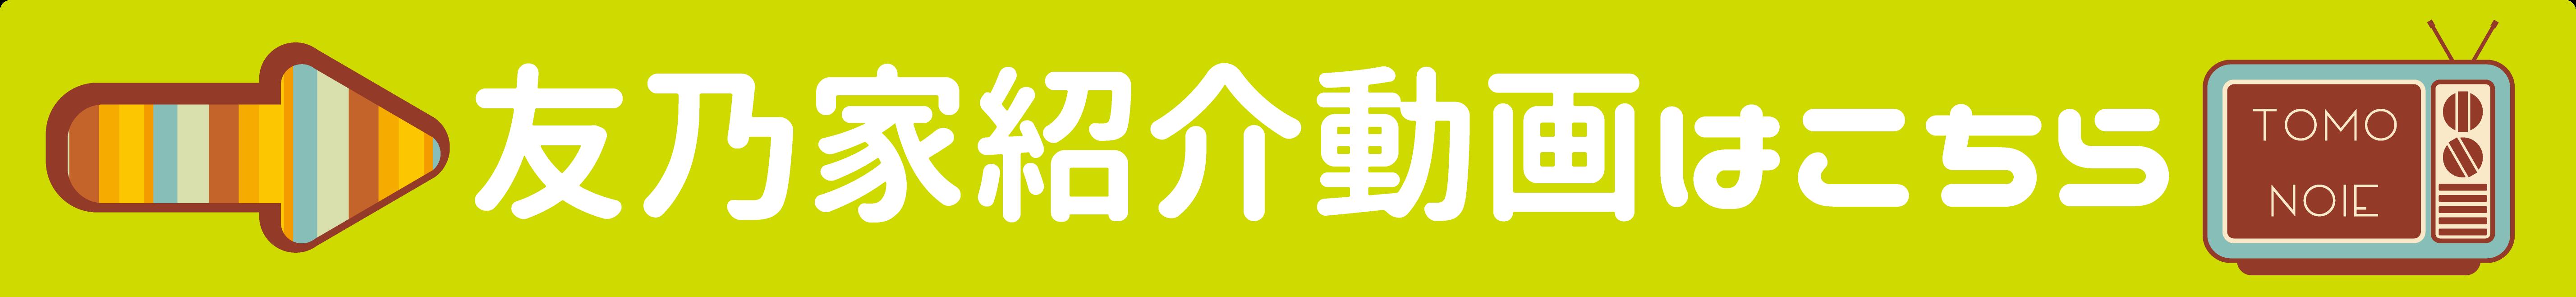 ol紹介動画バナー